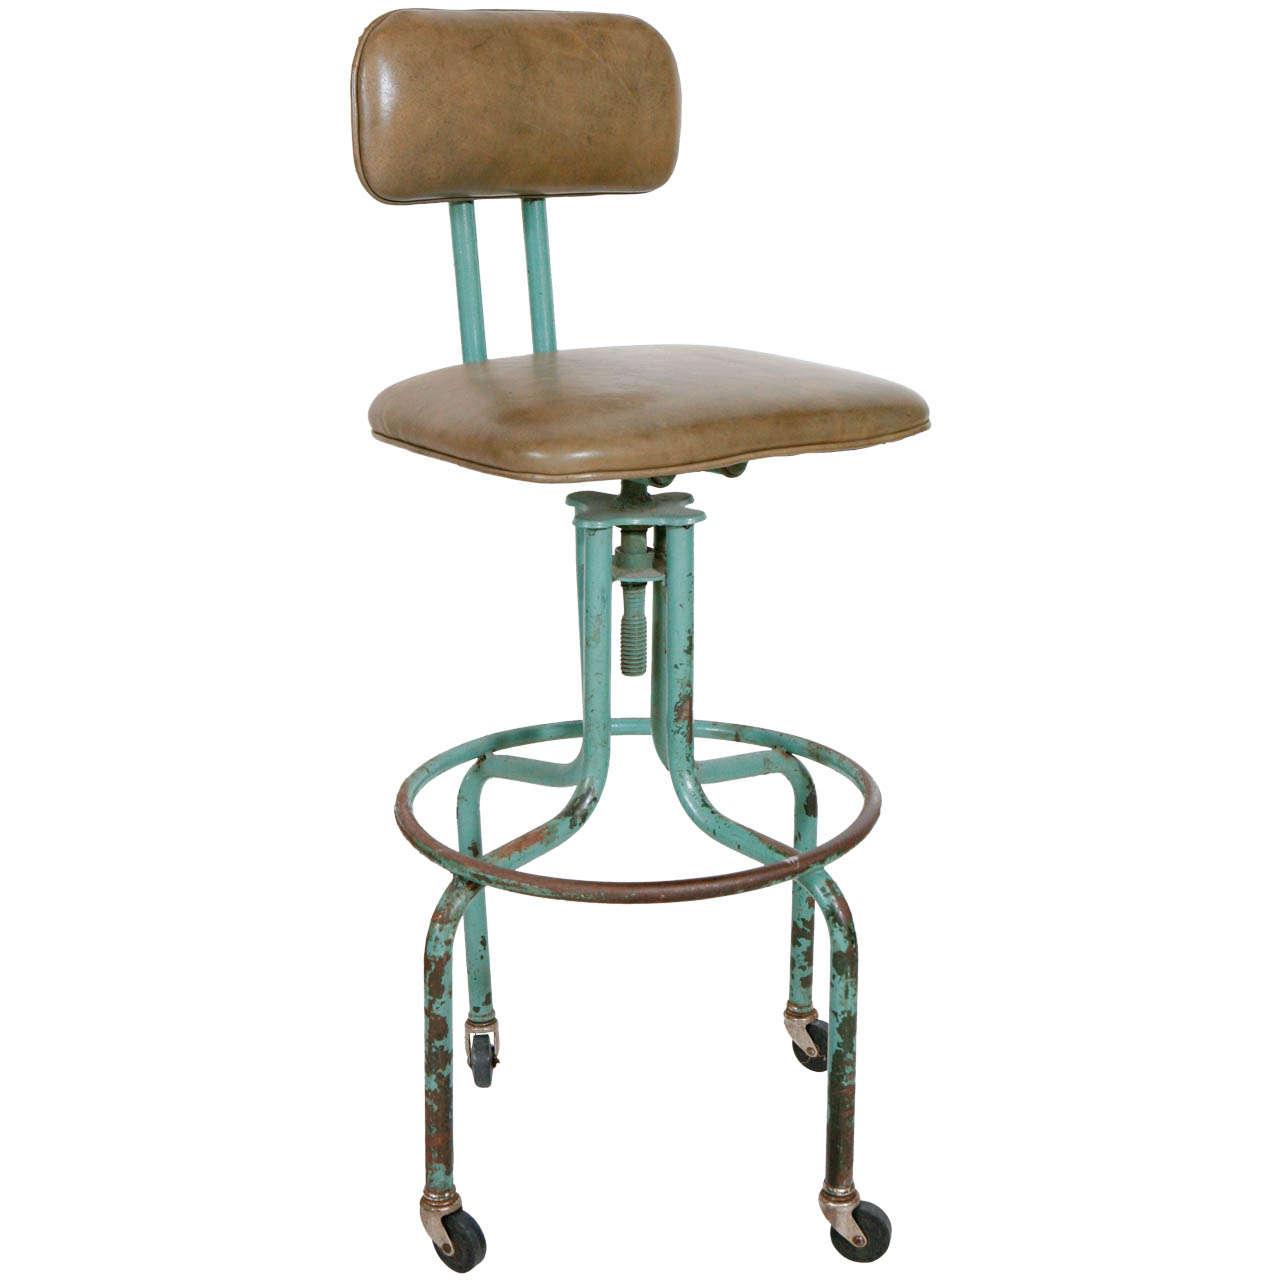 28 Vintage Green Workshop Stool With 1930 S  : X from scottkrieder.com size 1280 x 1280 jpeg 61kB